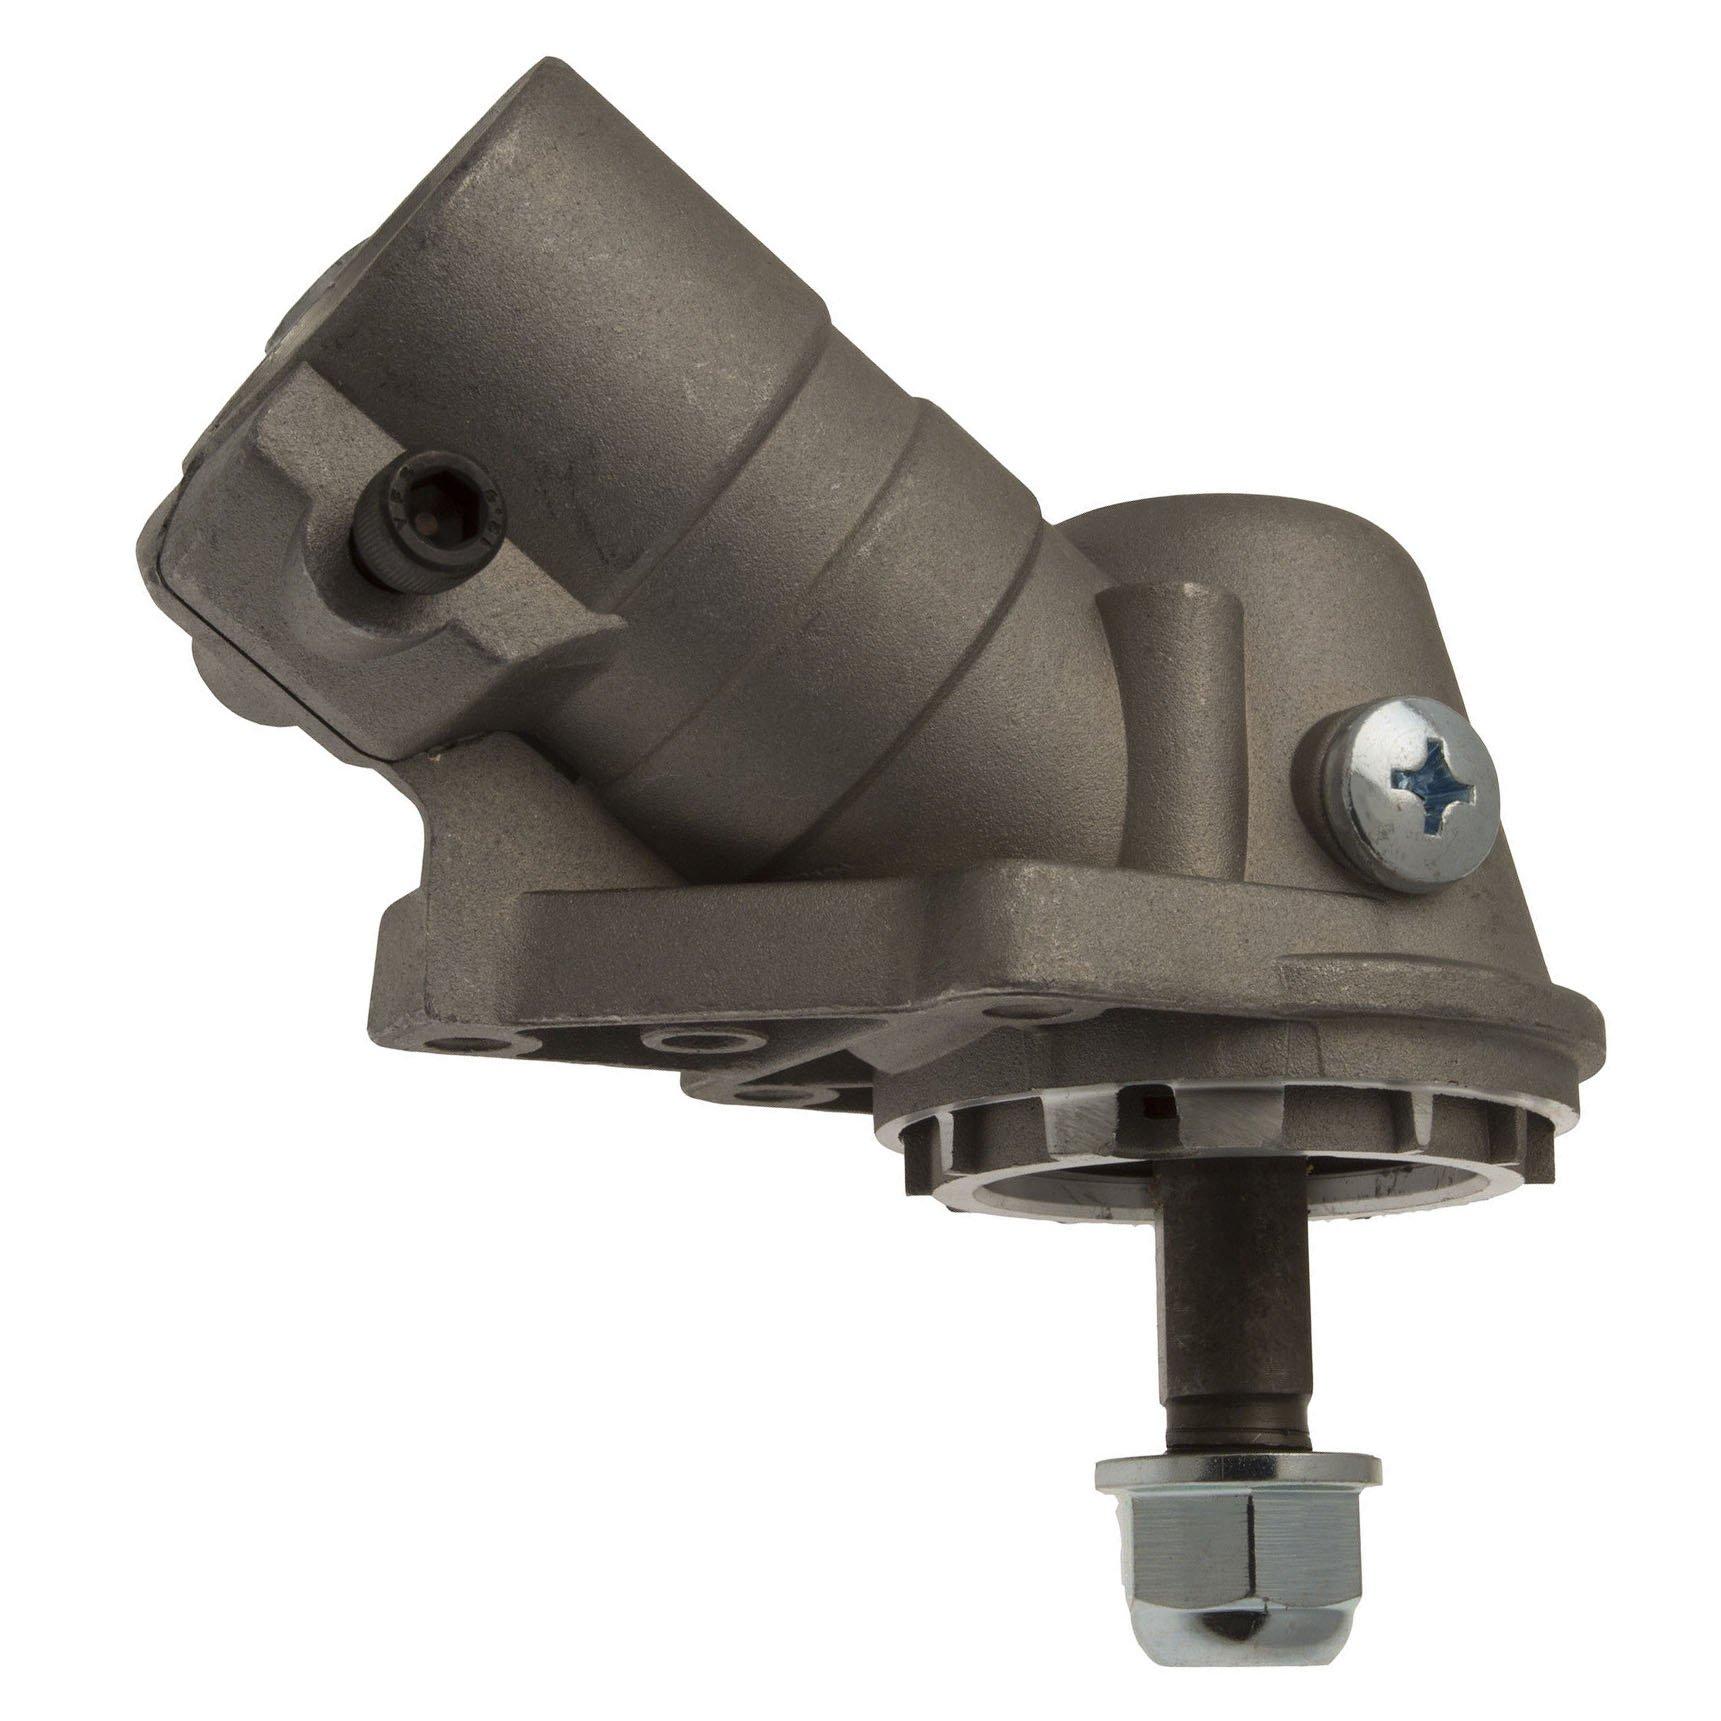 SPERTEK Gearbox Gear Stihl Brushcutyer FS500 FS550 FS550L Rep 4116 640 0105 35mm